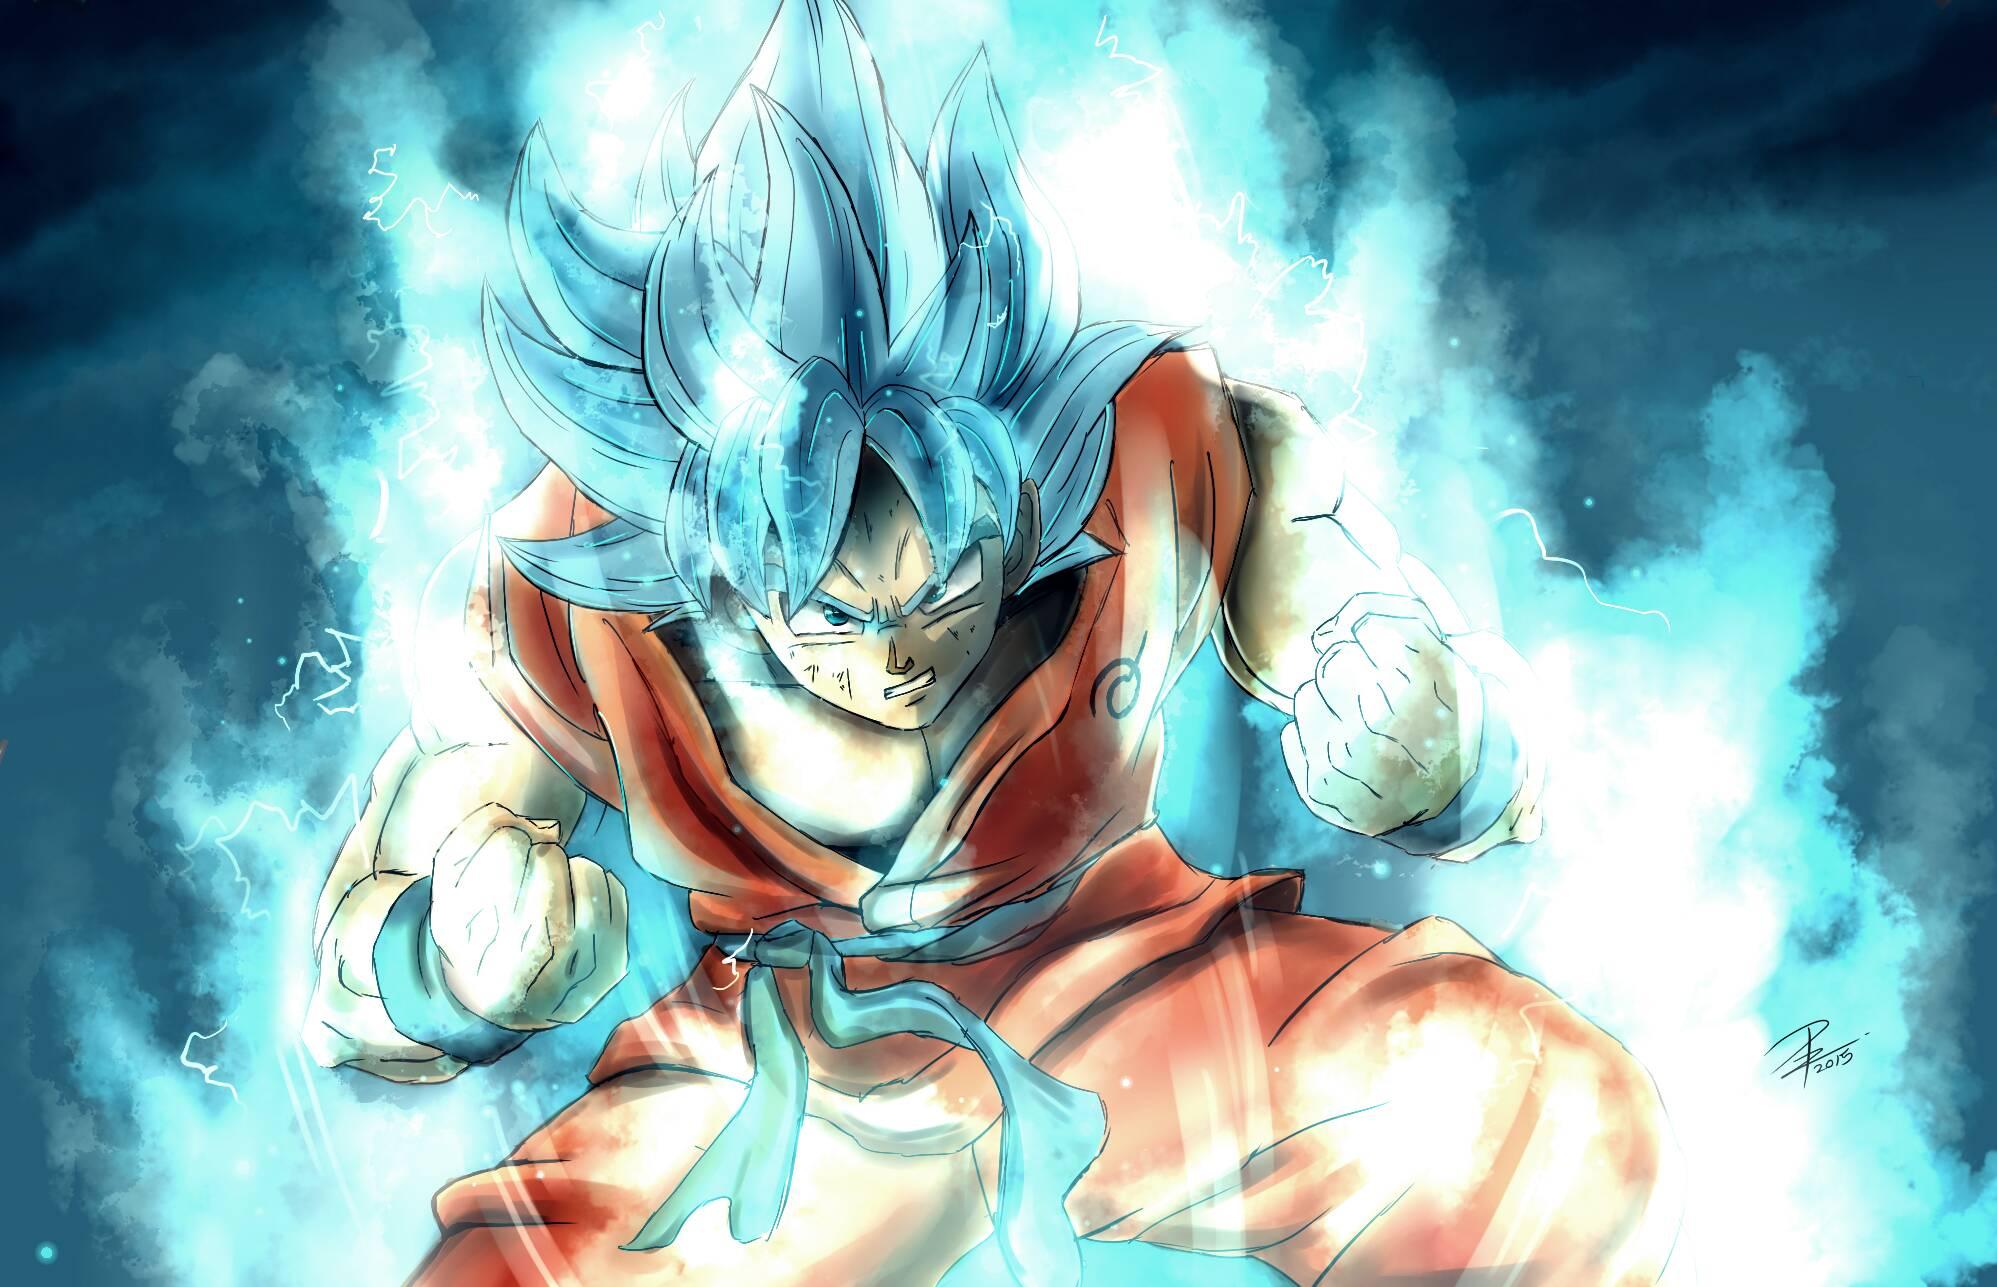 Dragon Ball Goku Wallpapers Top Free Dragon Ball Goku Backgrounds Wallpaperaccess